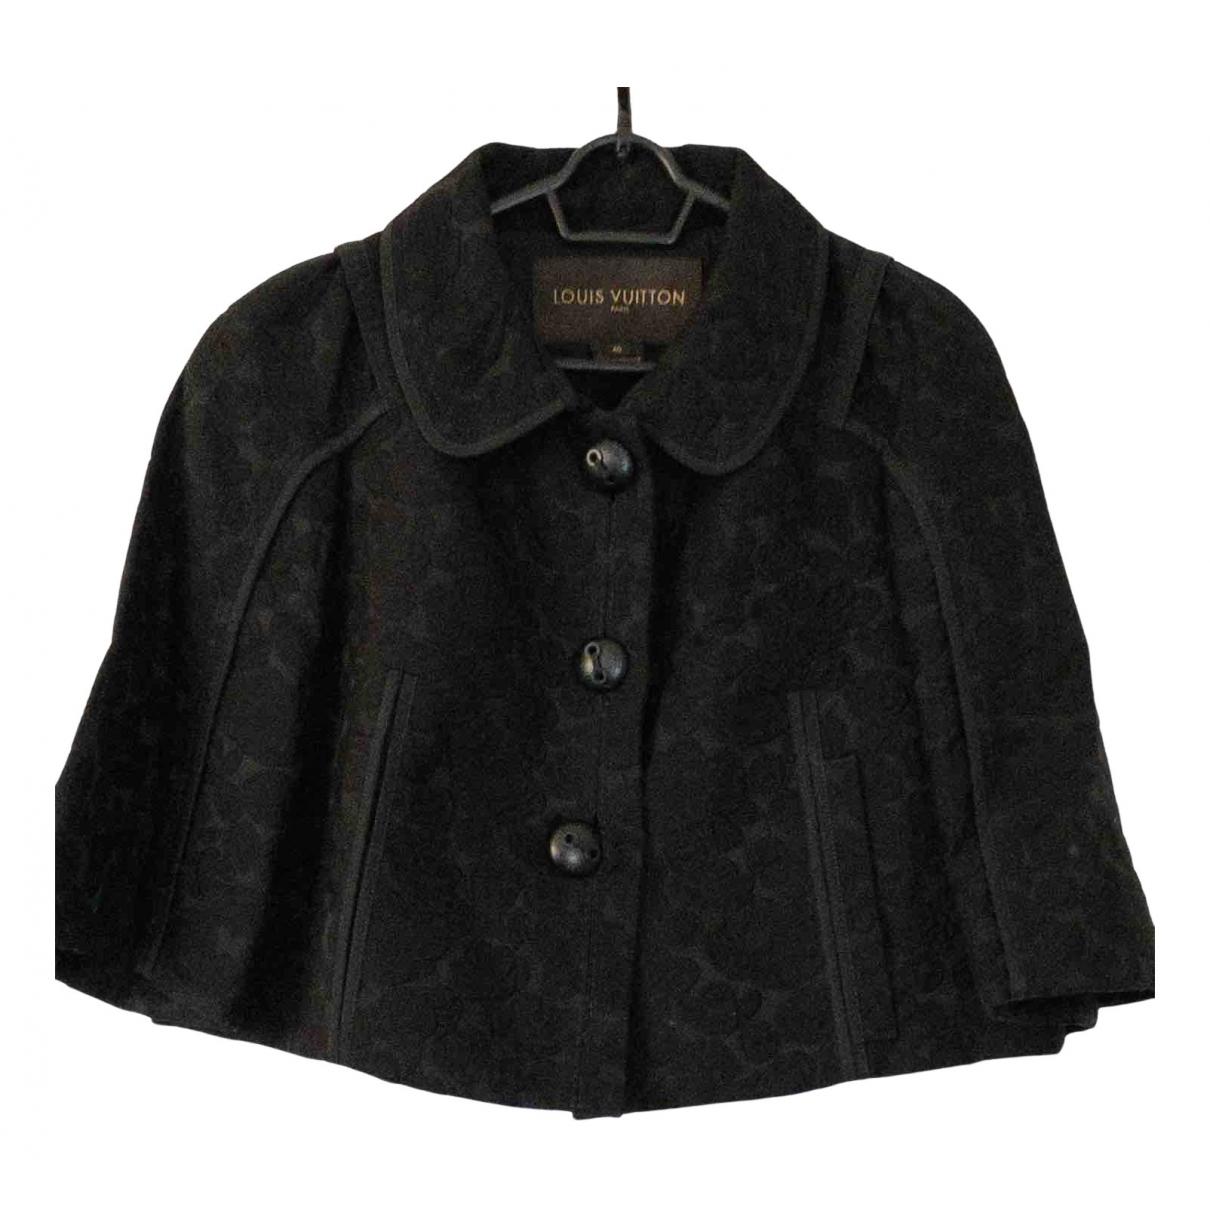 Louis Vuitton \N Jacke in  Schwarz Baumwolle